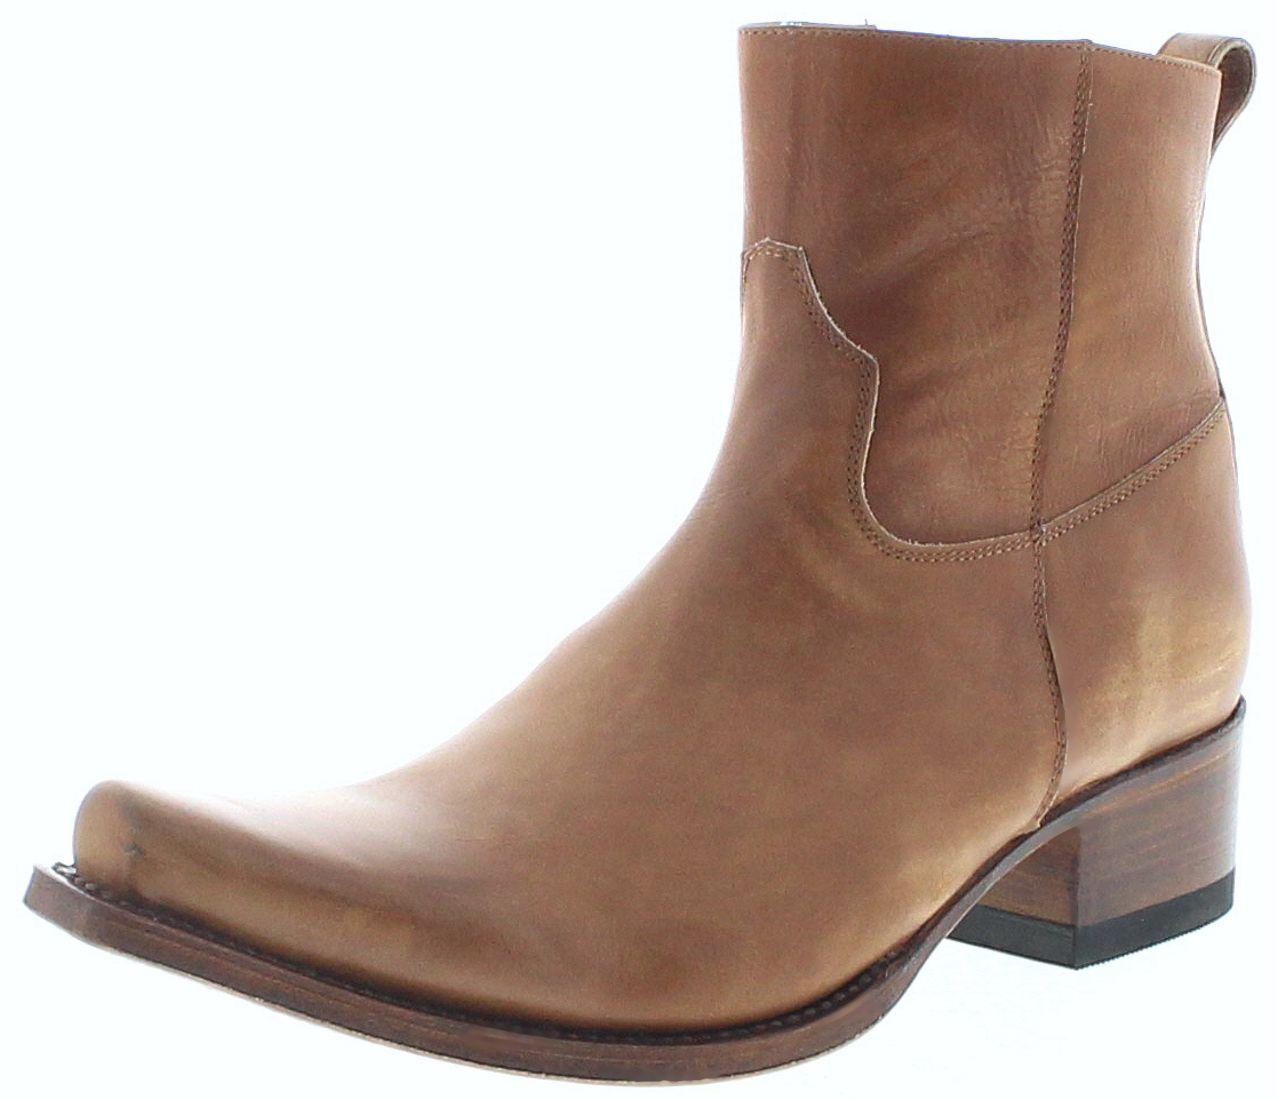 Sendra Boots 12322 023 Lavado Herren Stiefelette - braun